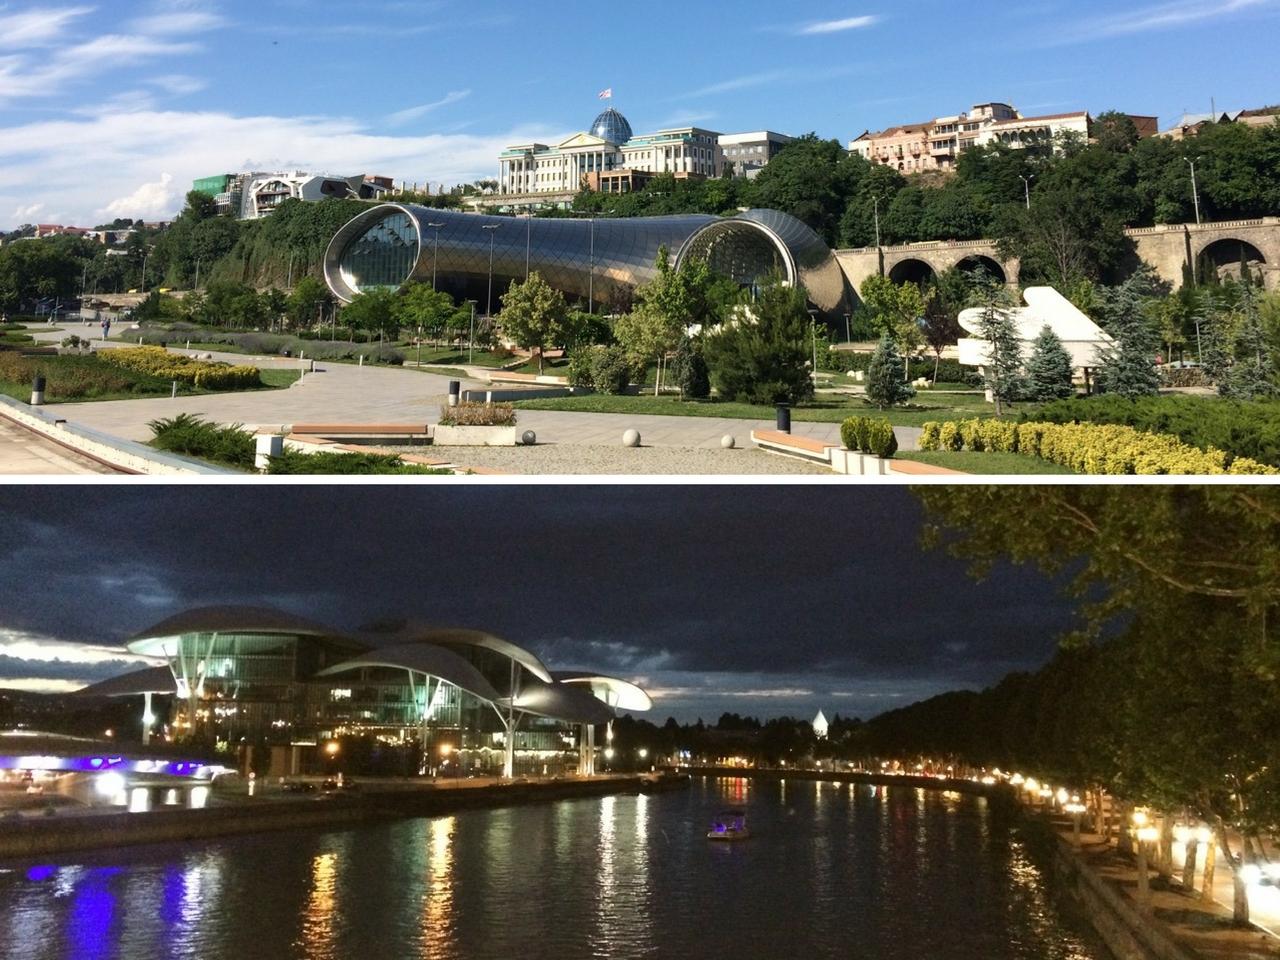 Tbilisi photos